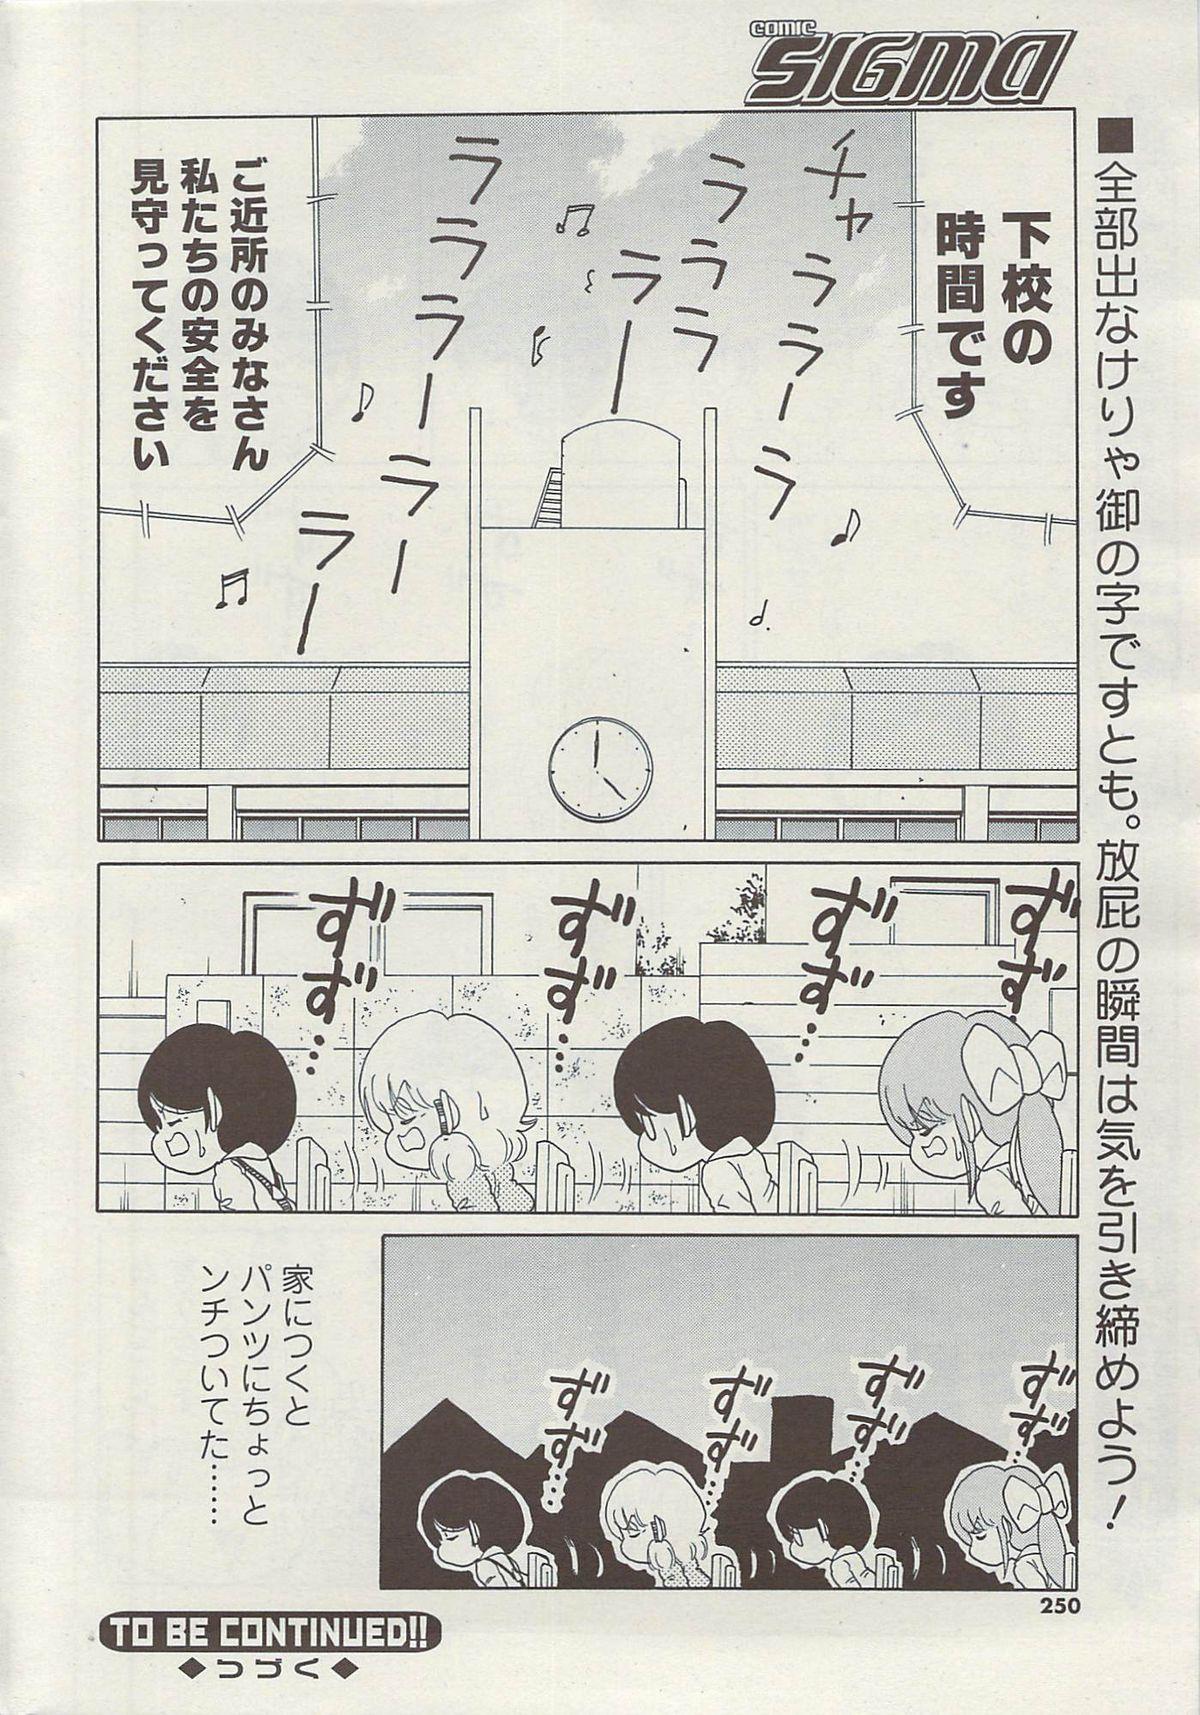 COMIC Sigma Vol.34 249